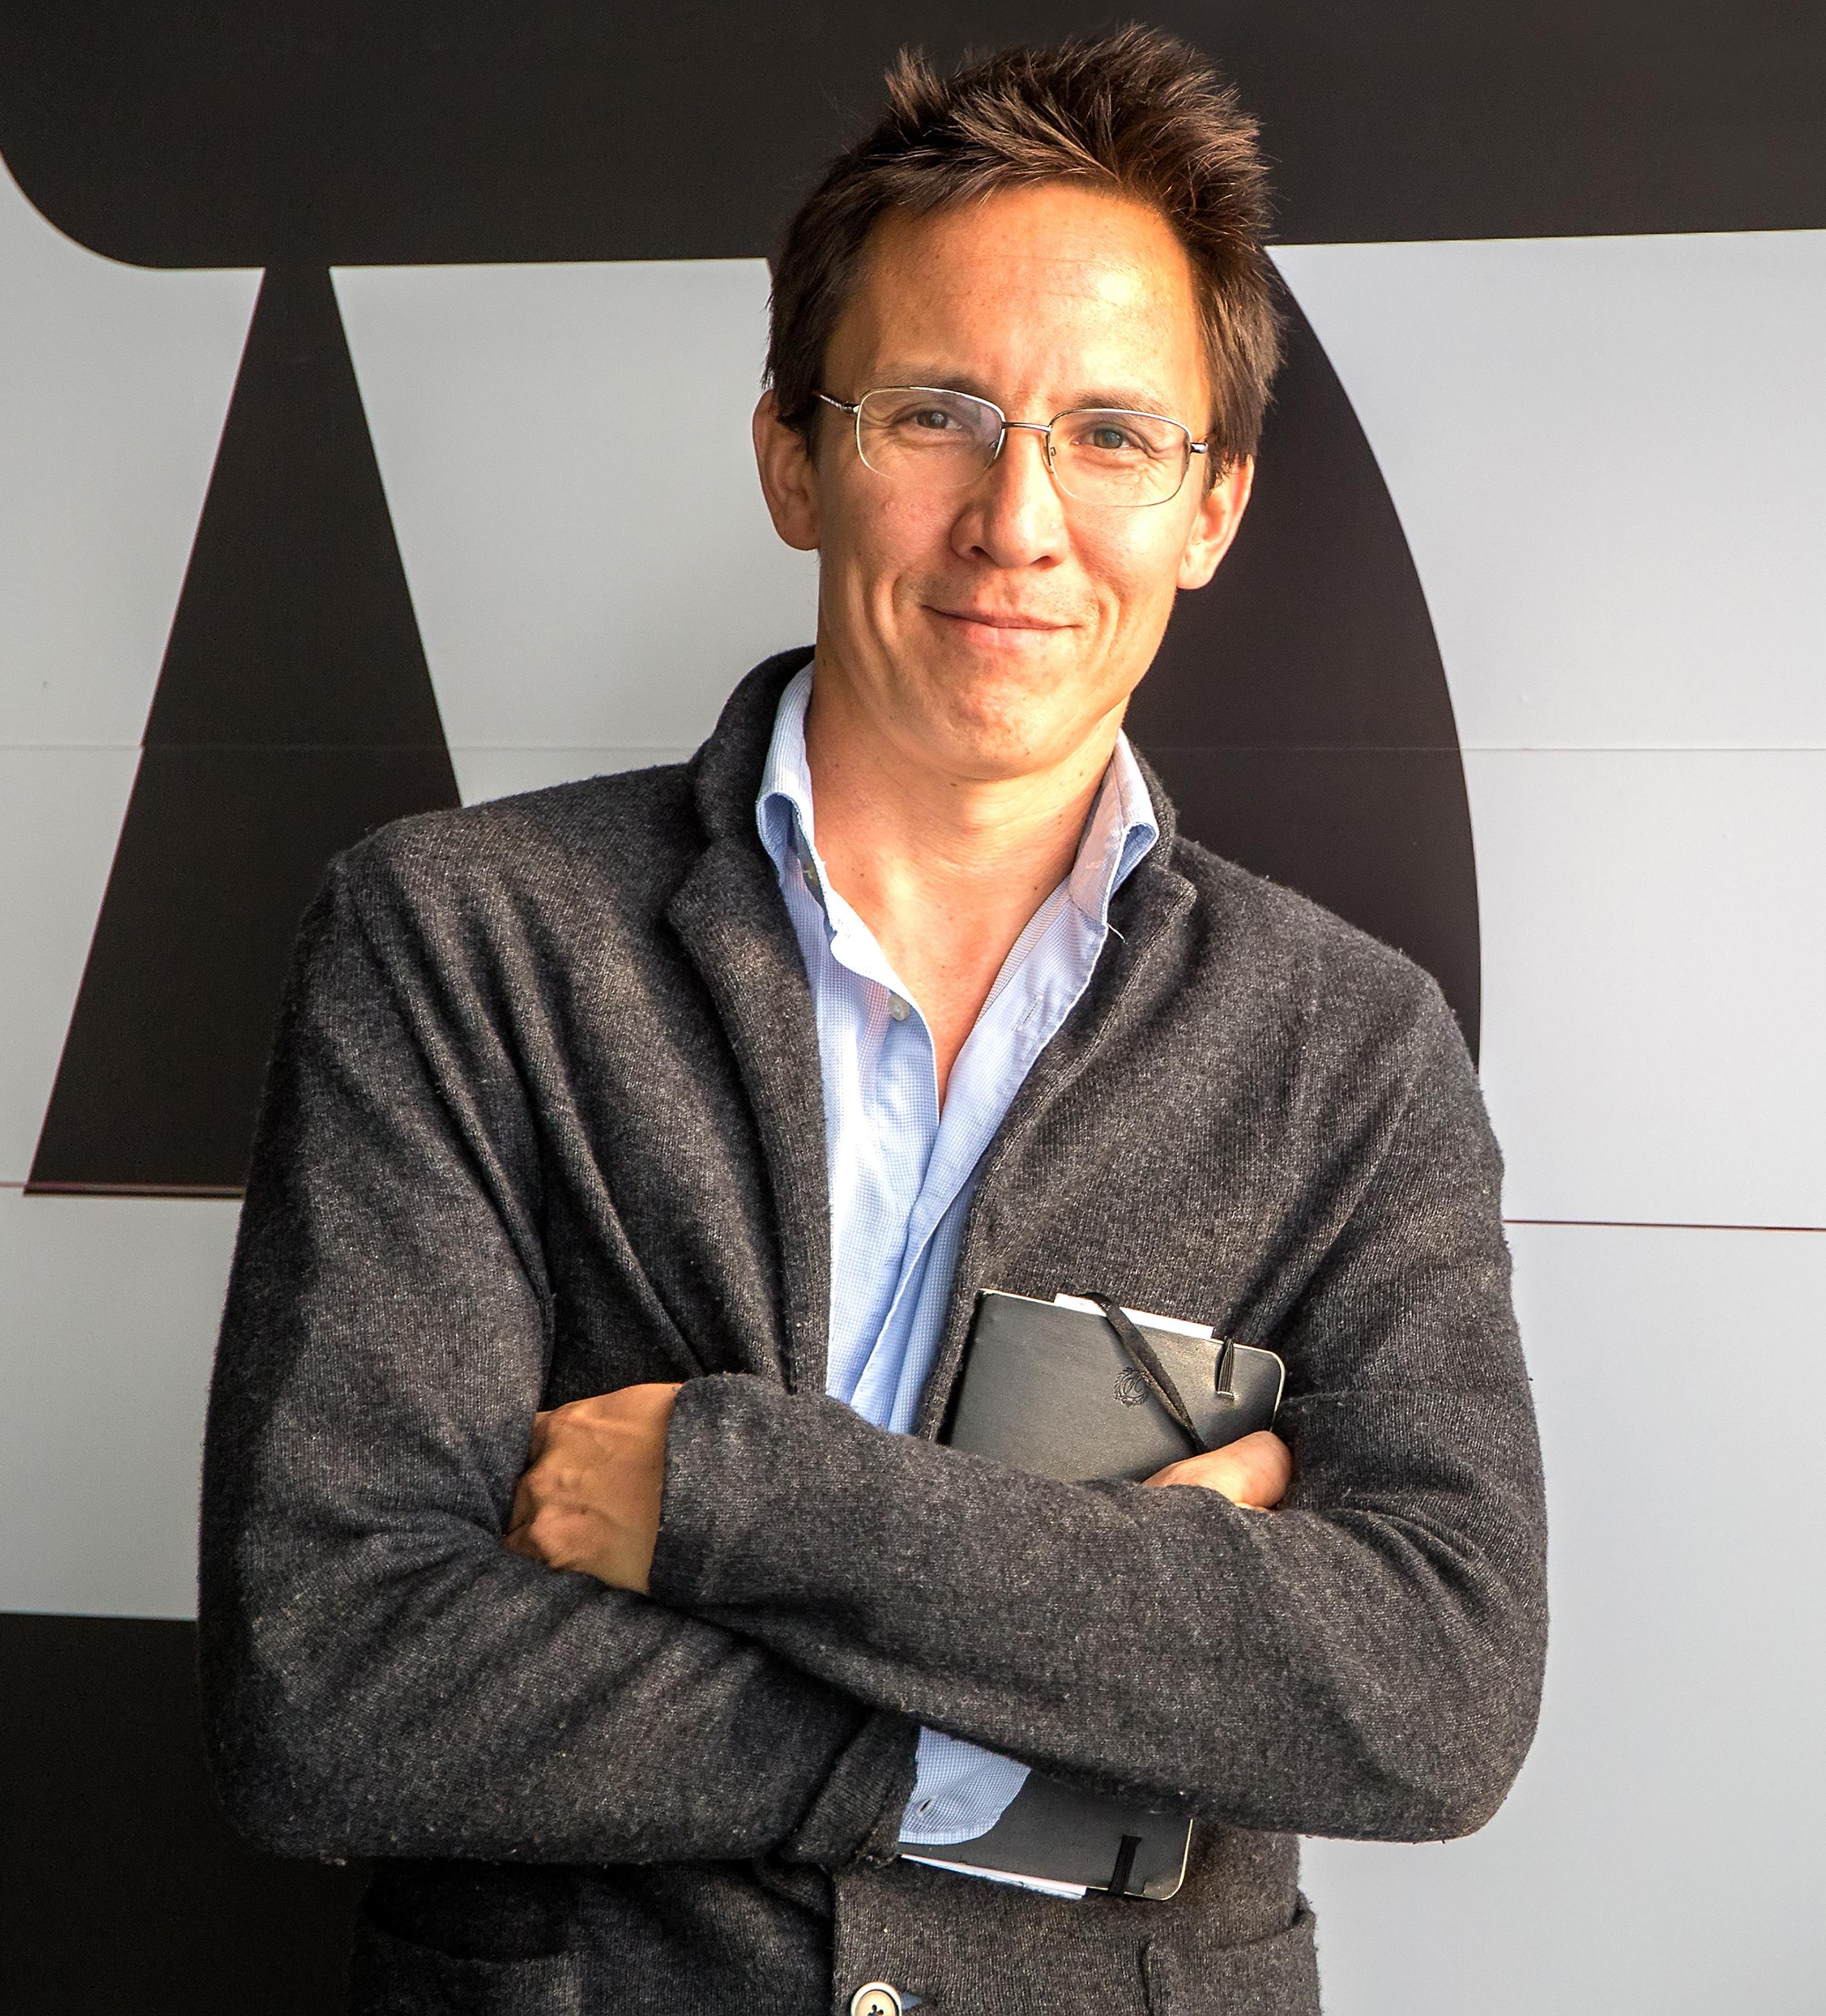 Jens Kolind